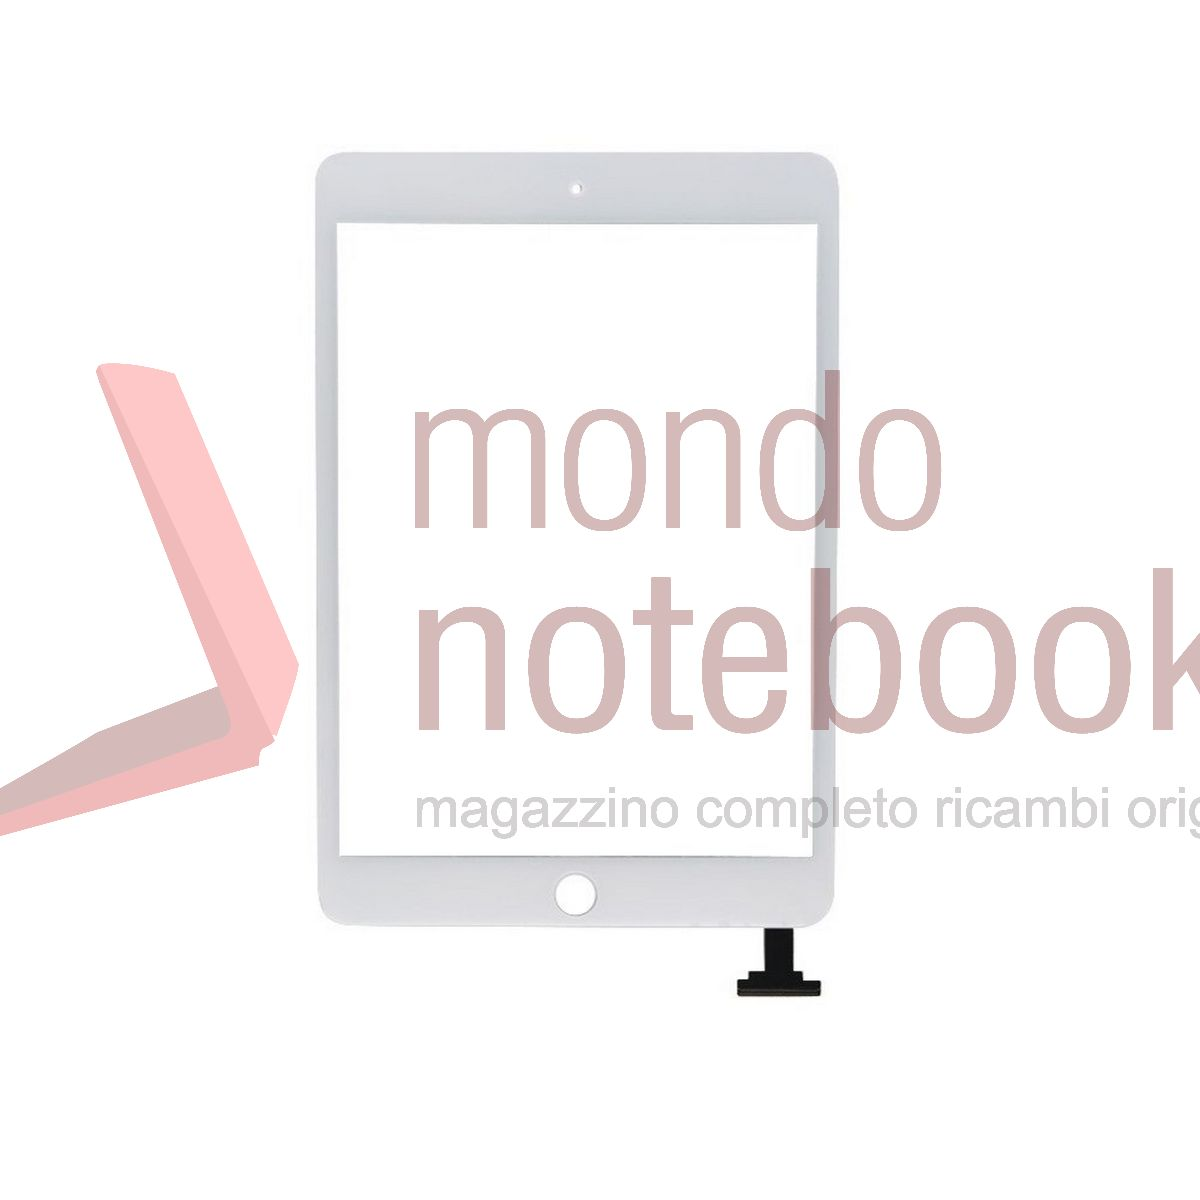 https://www.mondonotebook.it/3220/vetro-touch-screen-apple-ipad-mini-bianco-white-touchscreen-grado-s.jpg